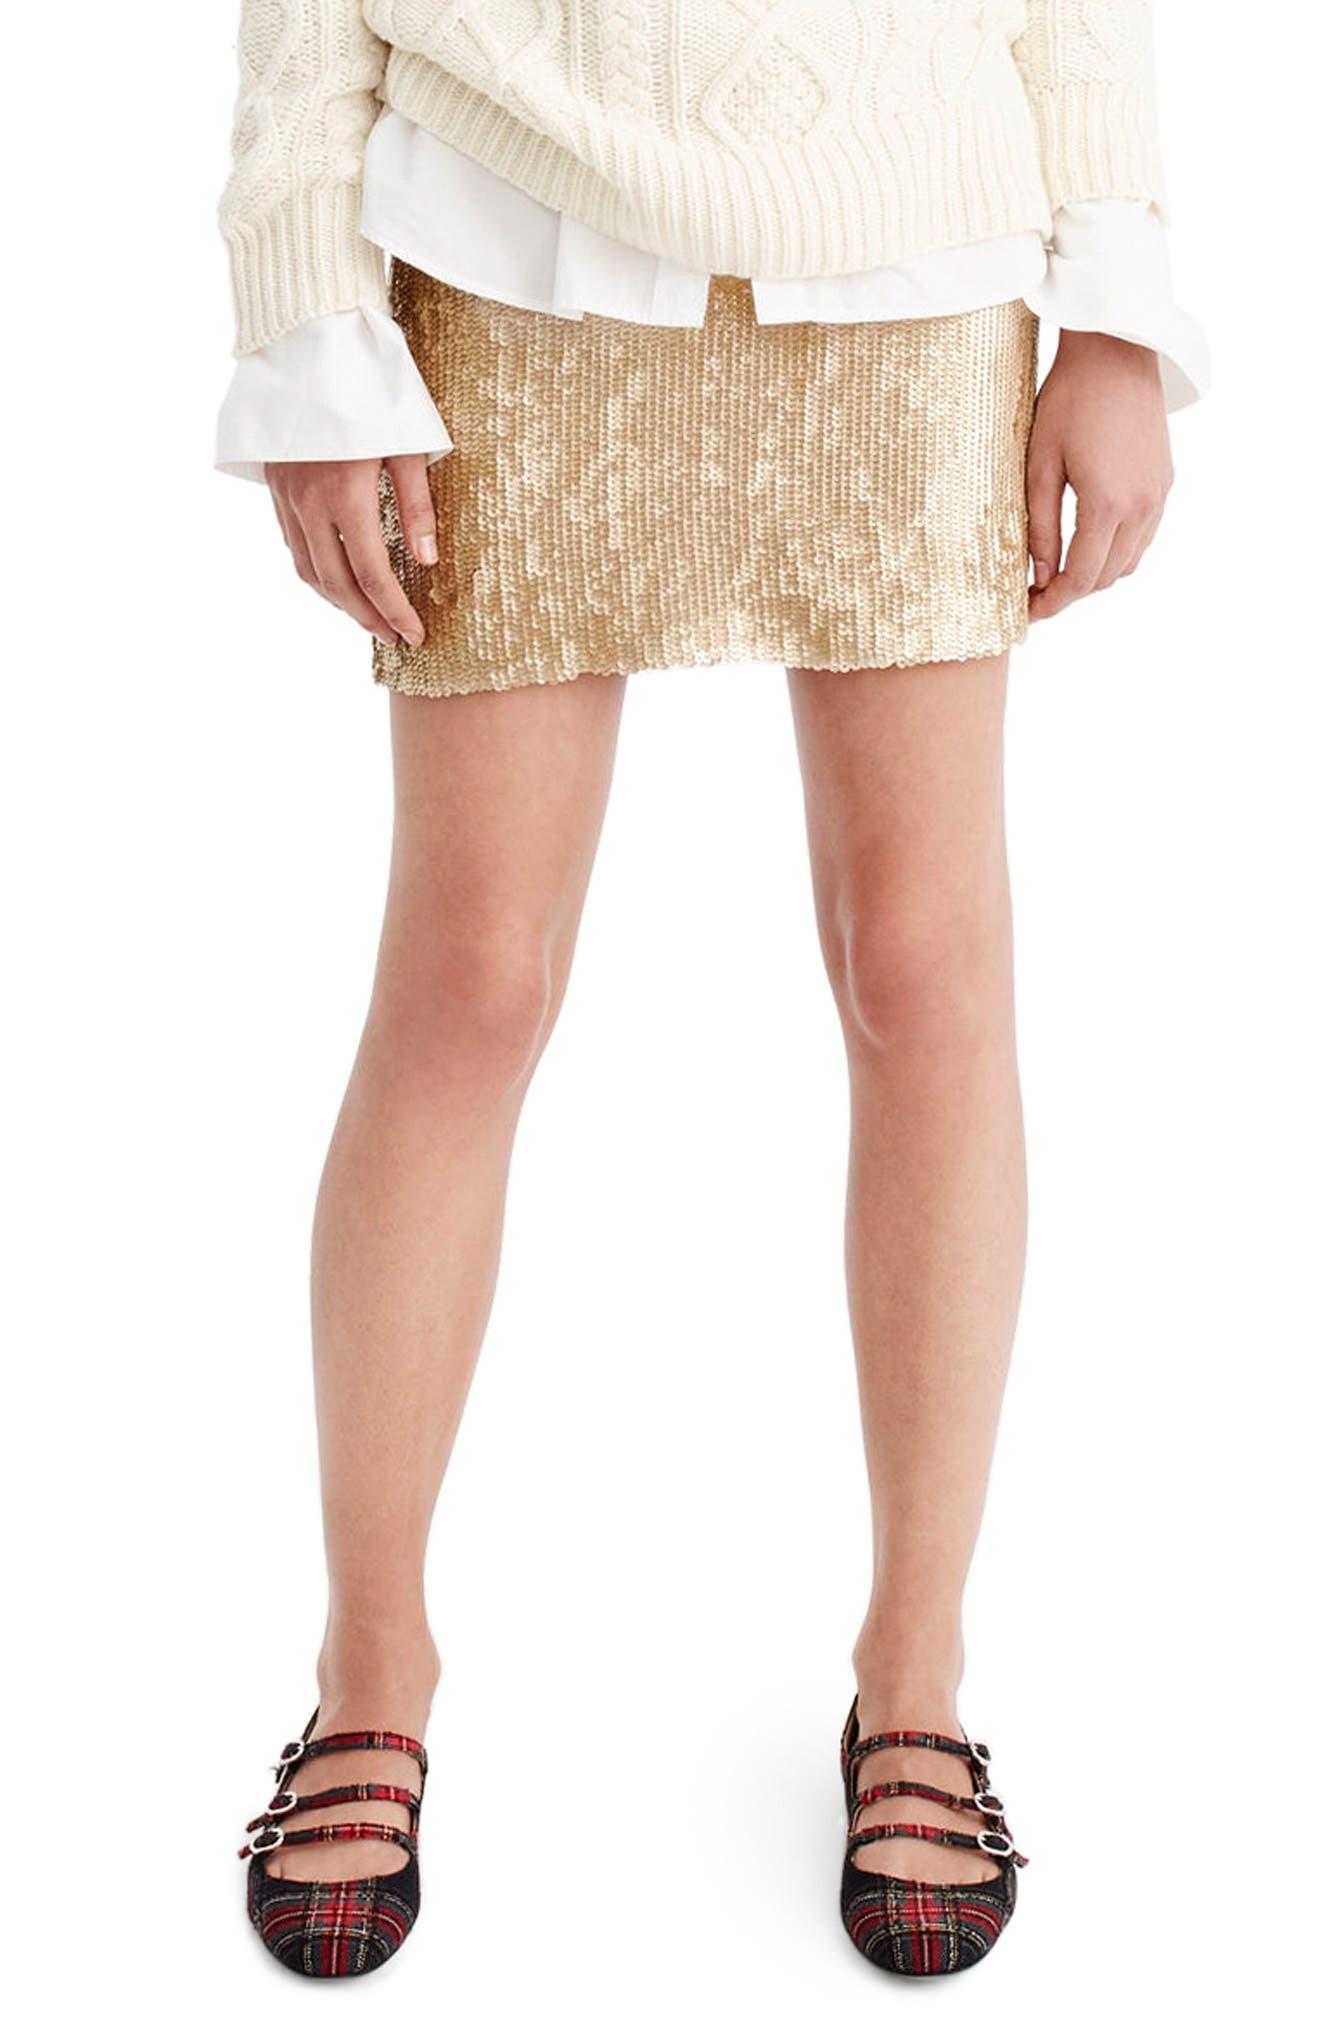 Alternate Image 1 Selected - J.Crew Sequin Miniskirt (Regular & Petite)